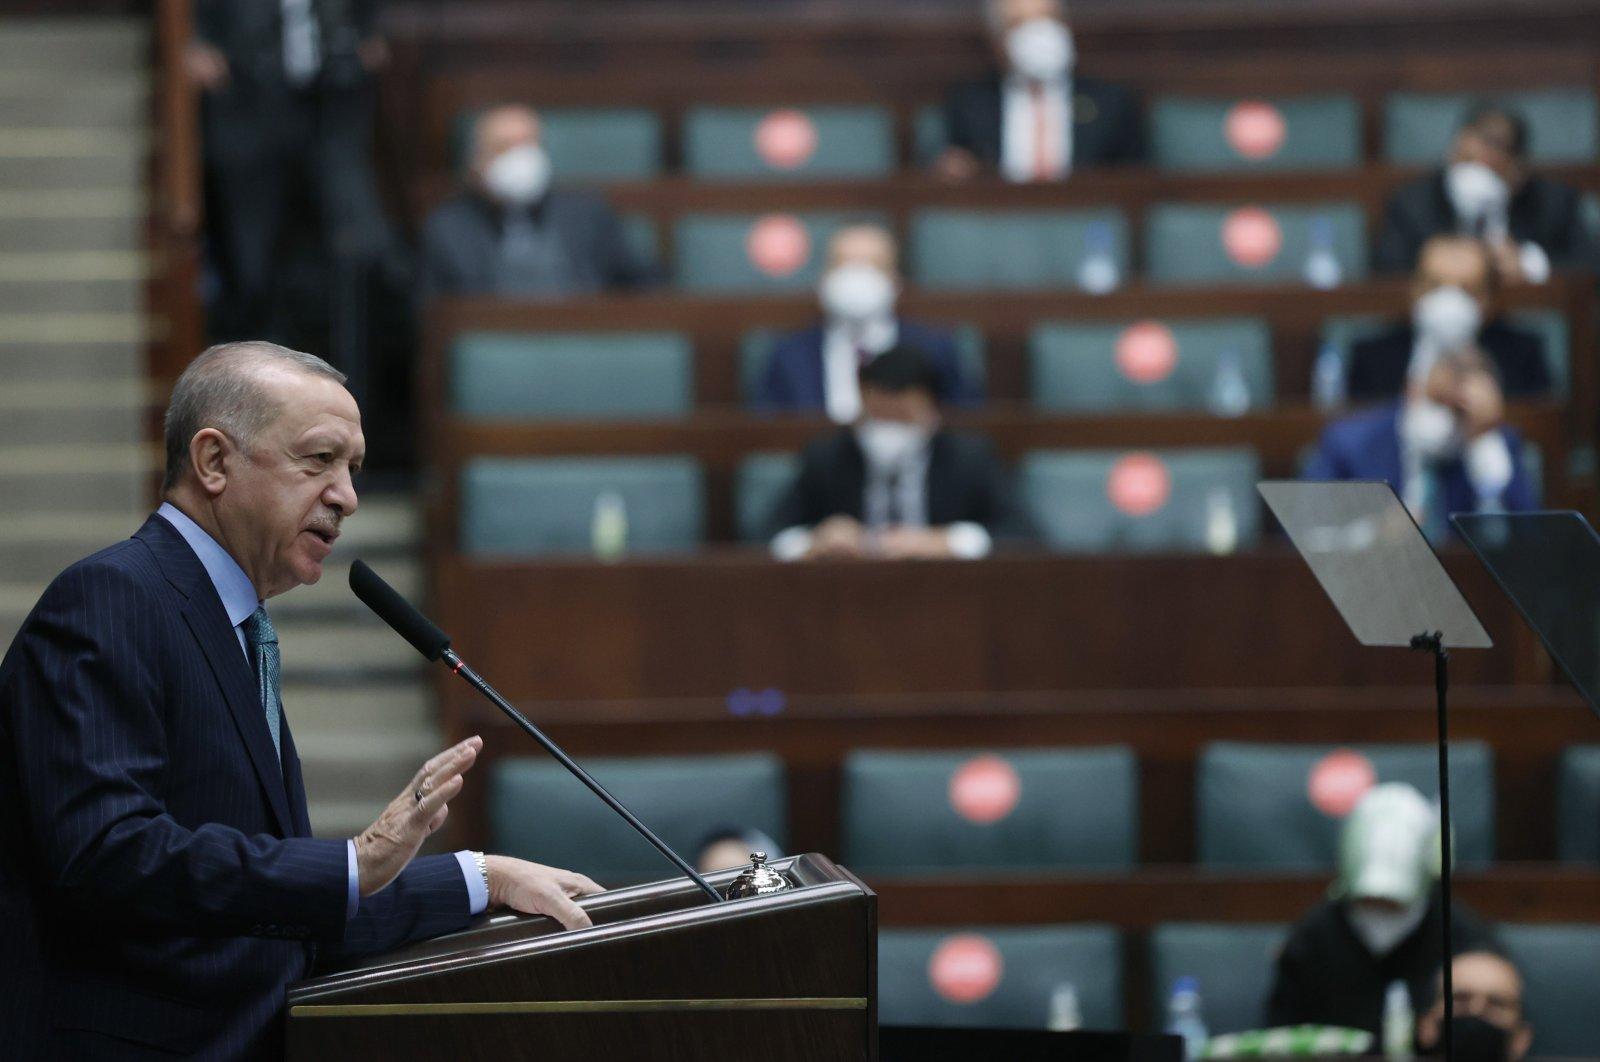 Turkey to take revenge for citizens killed by PKK terrorists: Erdoğan